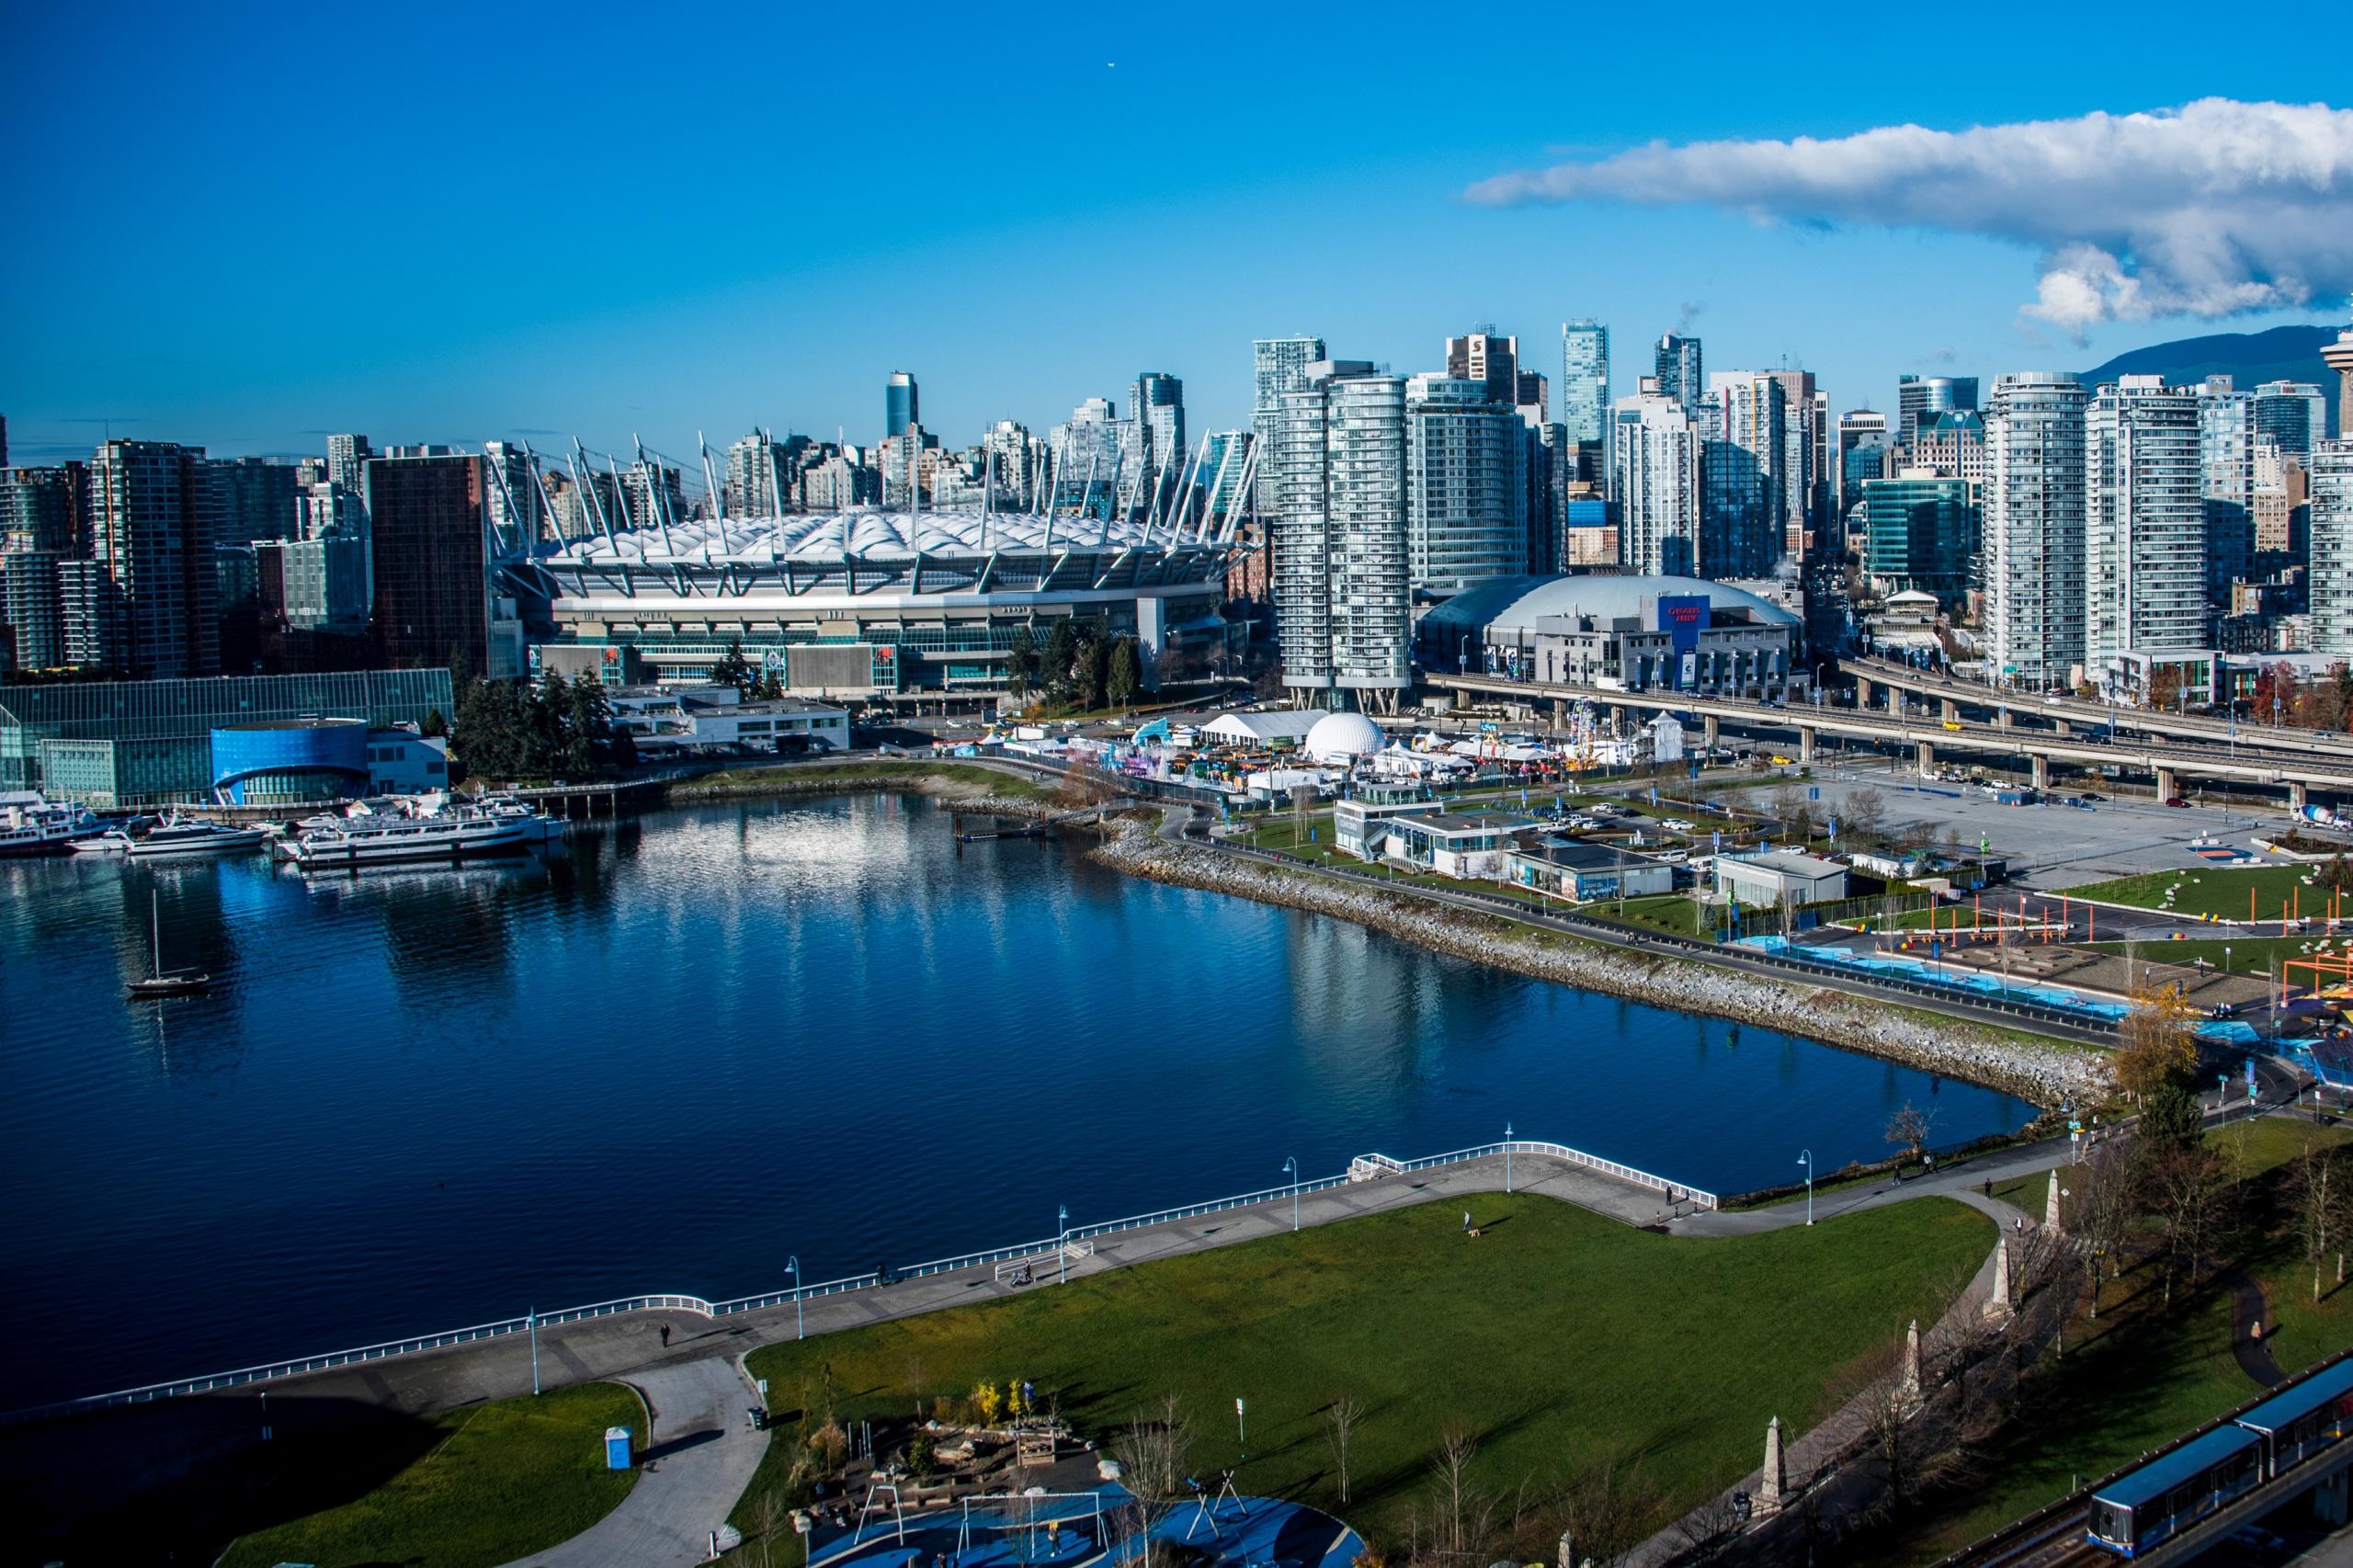 Фото Ванкувер Канада Залив Причалы город Здания 2560x1706 Пирсы залива заливы Пристань Дома Города